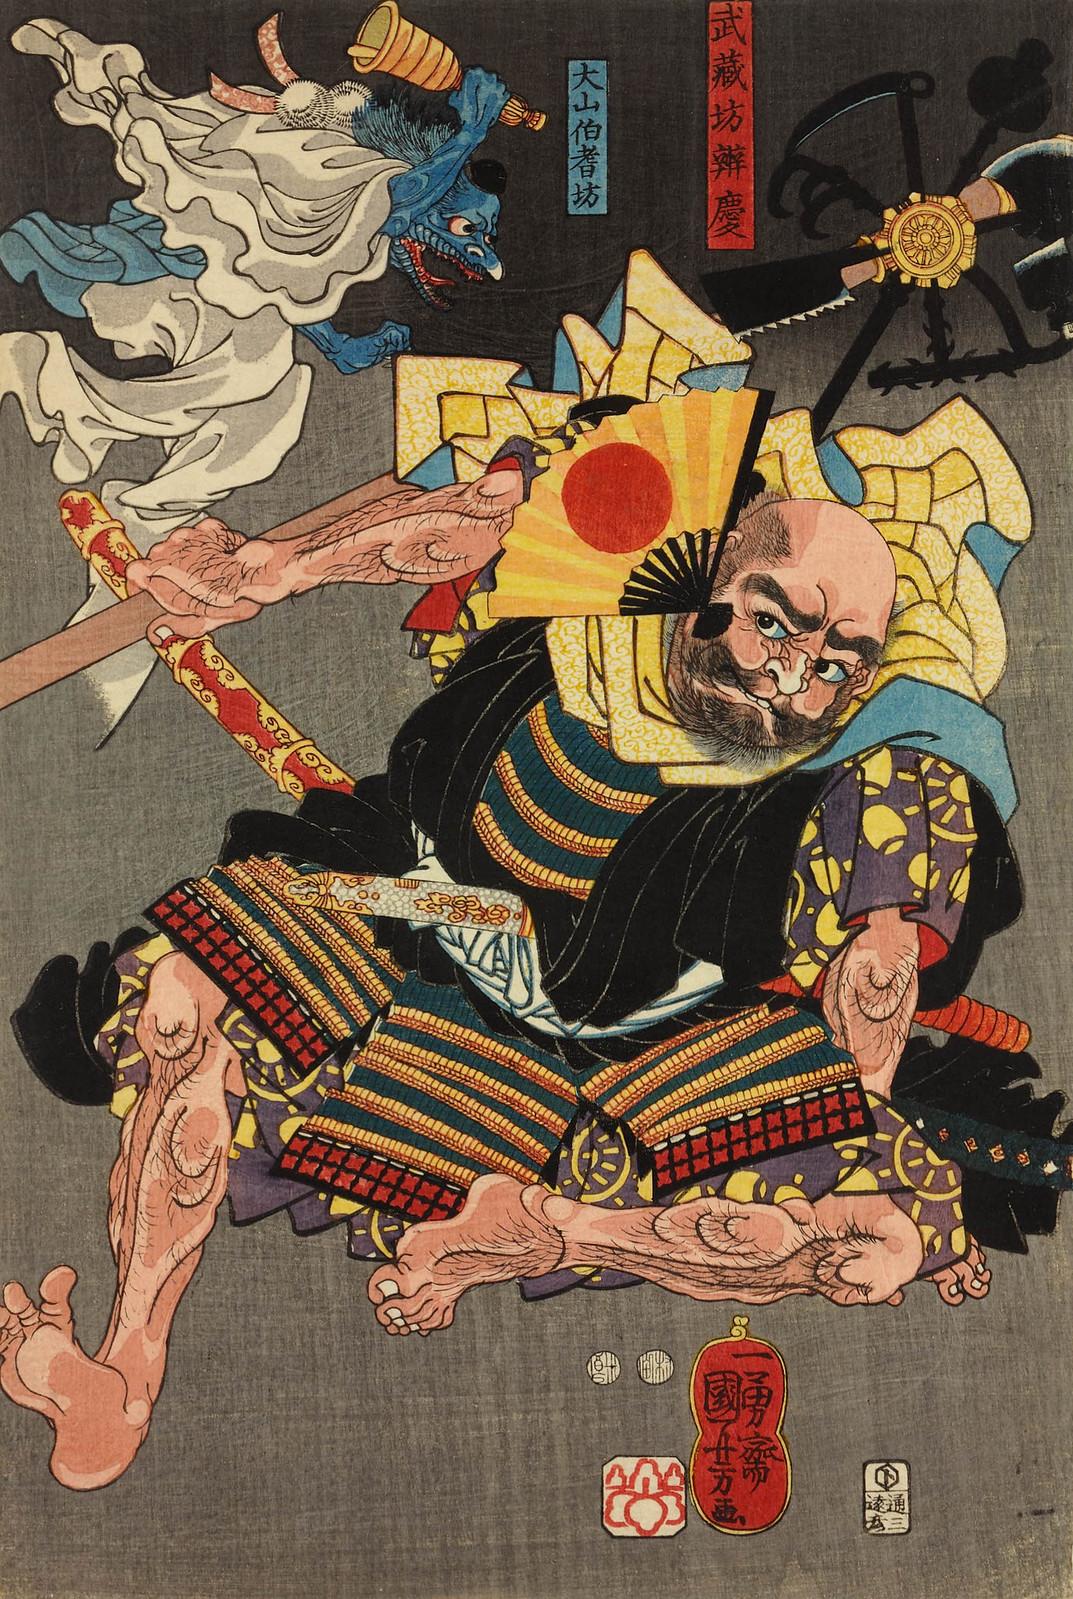 Utagawa Kuniyoshi - Ushiwakamaru (Yoshitsune) Fighting Benkei with the Help of the Tengu, 1847-50 (right panel)